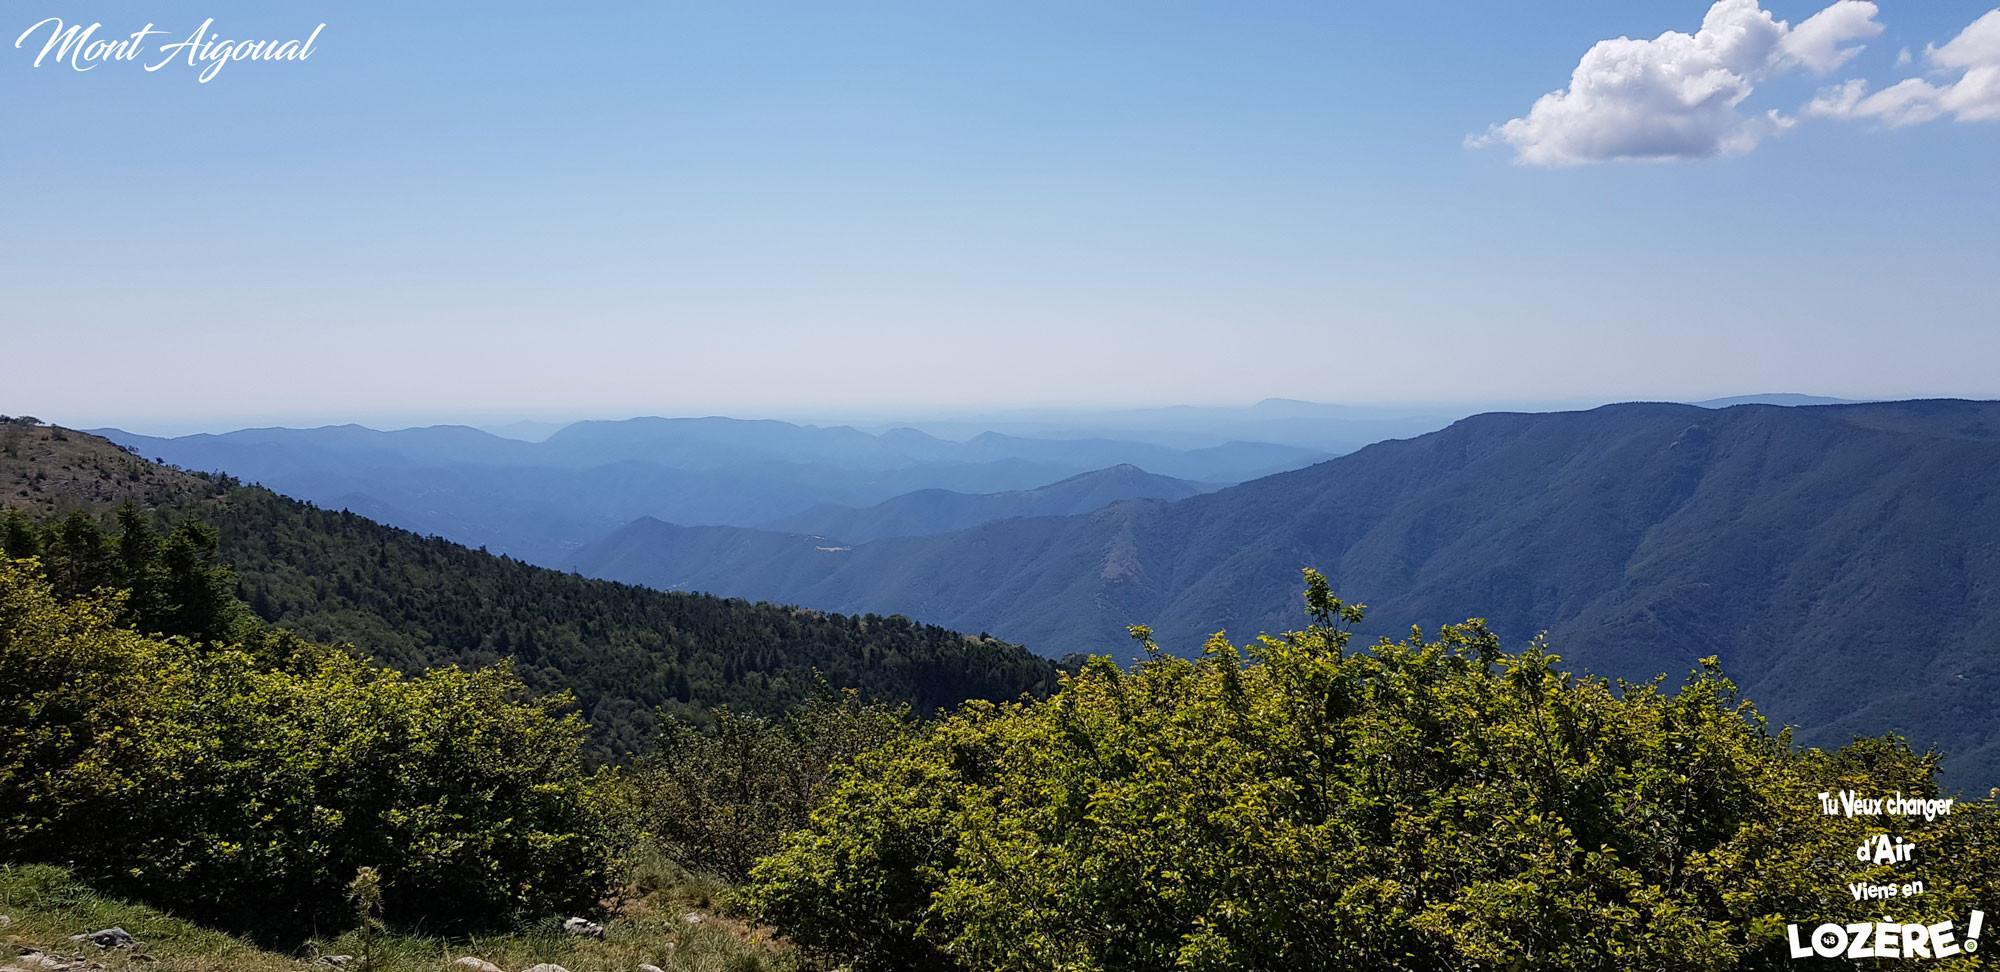 Mont-Aigoual-2.jpg